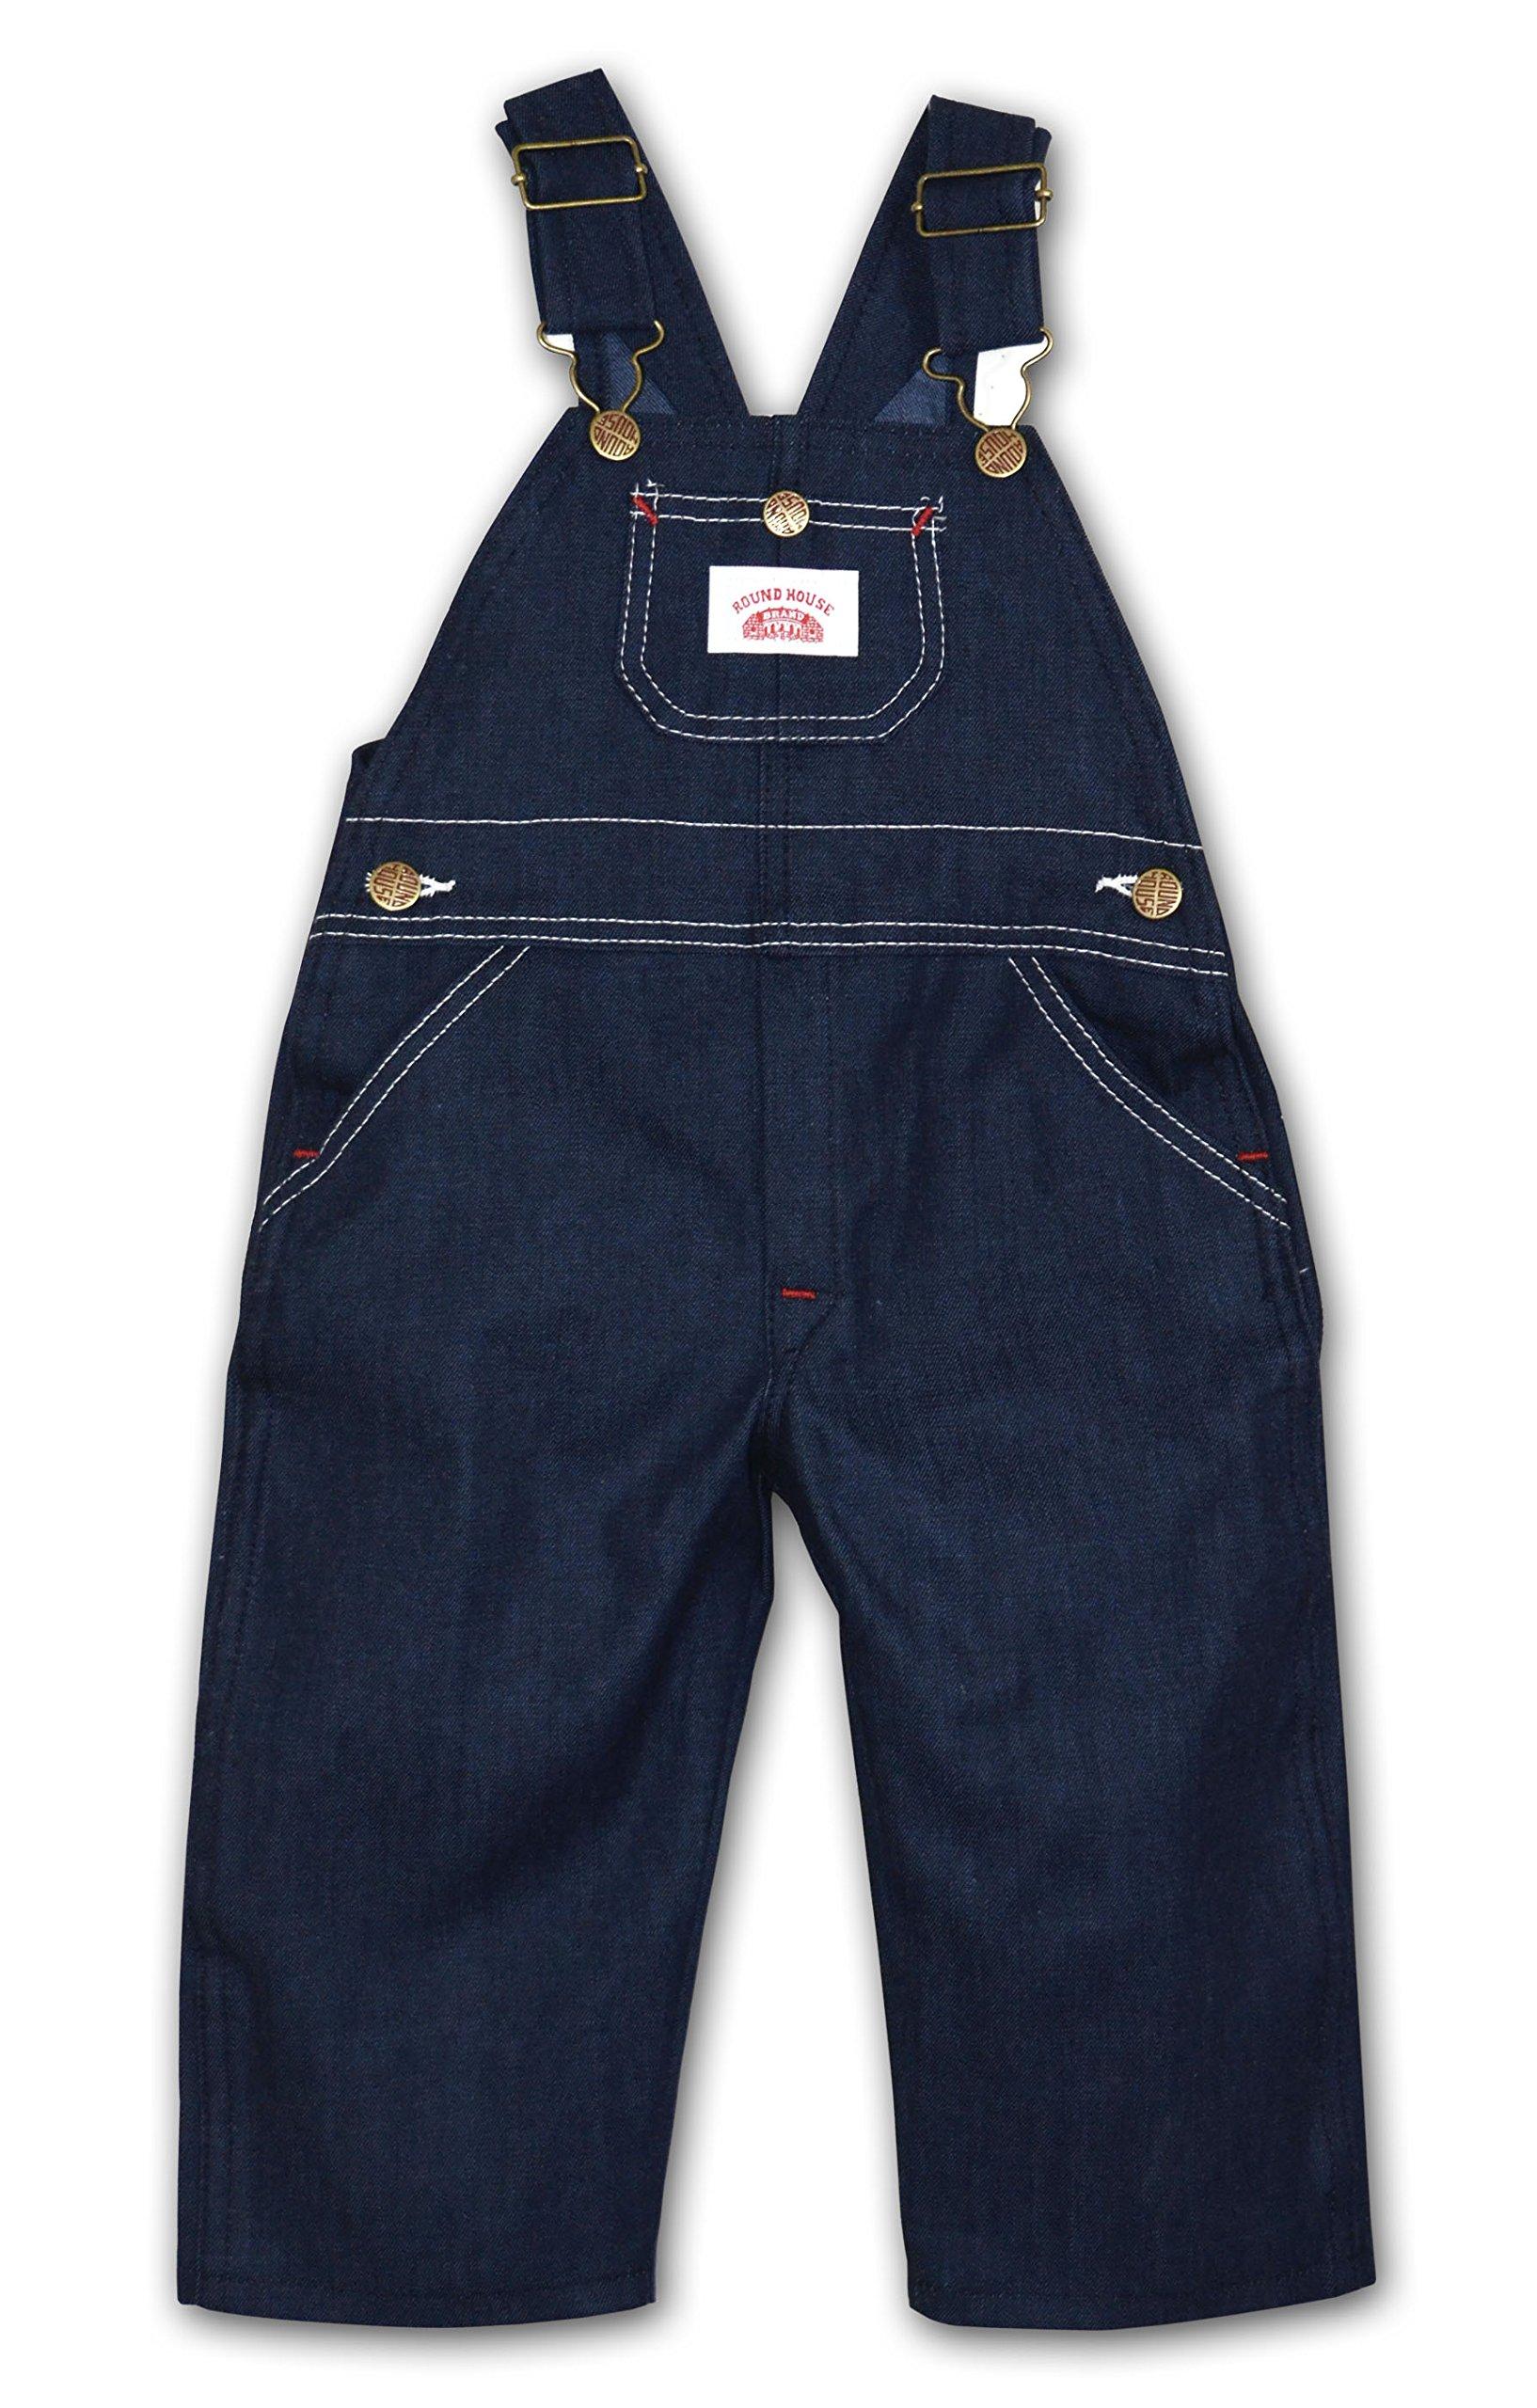 Round House Toddler Bib Overalls - Denim 2T-4T (Blue 2T)